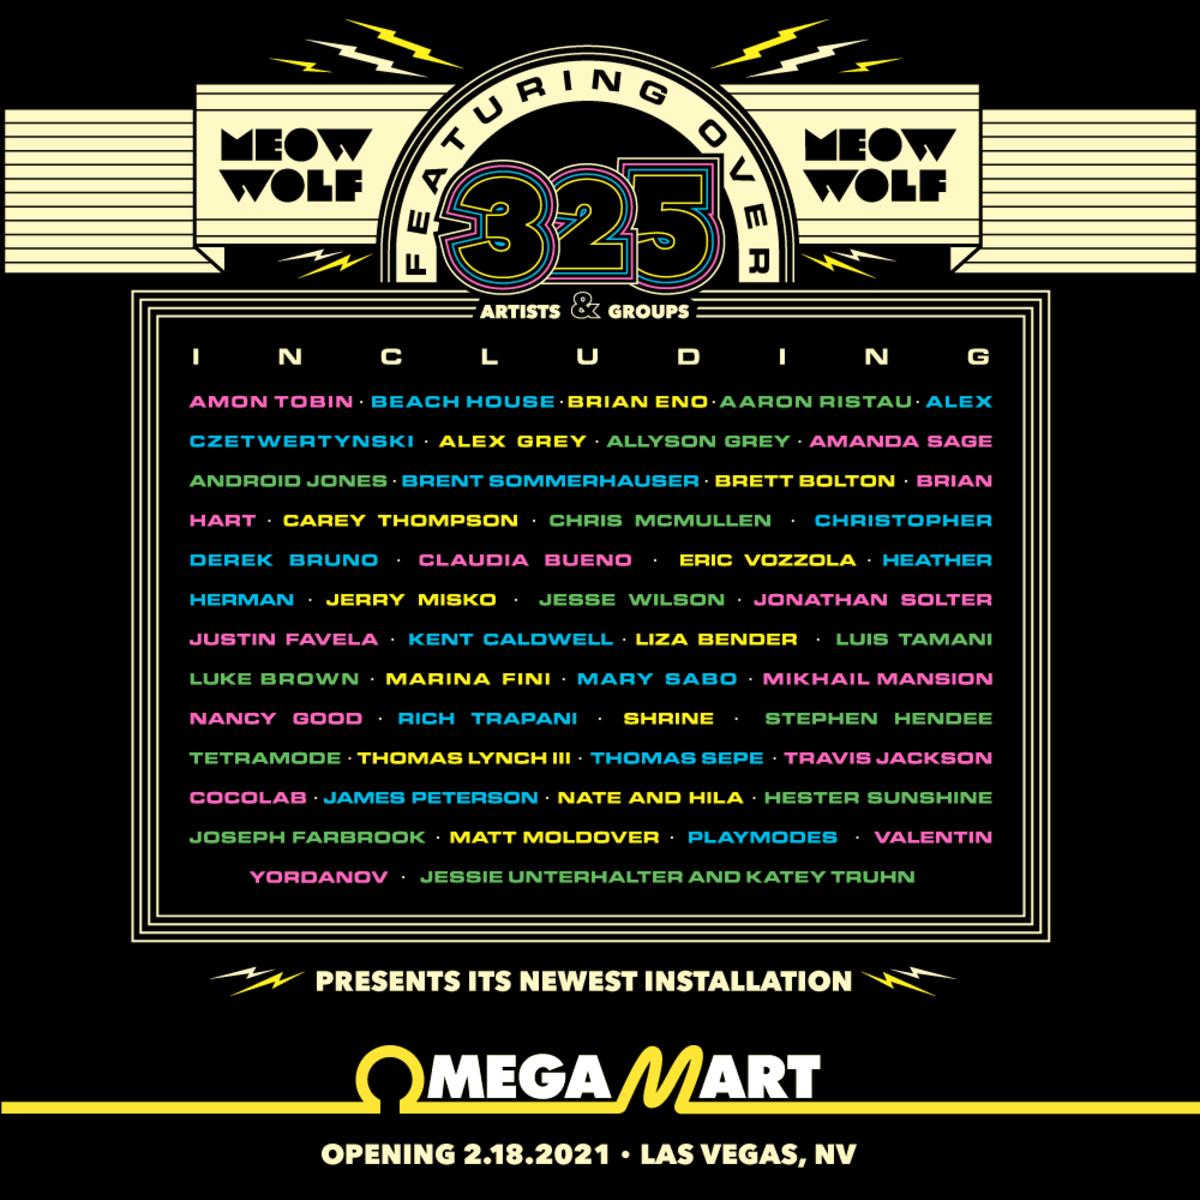 Omega Mart 2021 Lineup